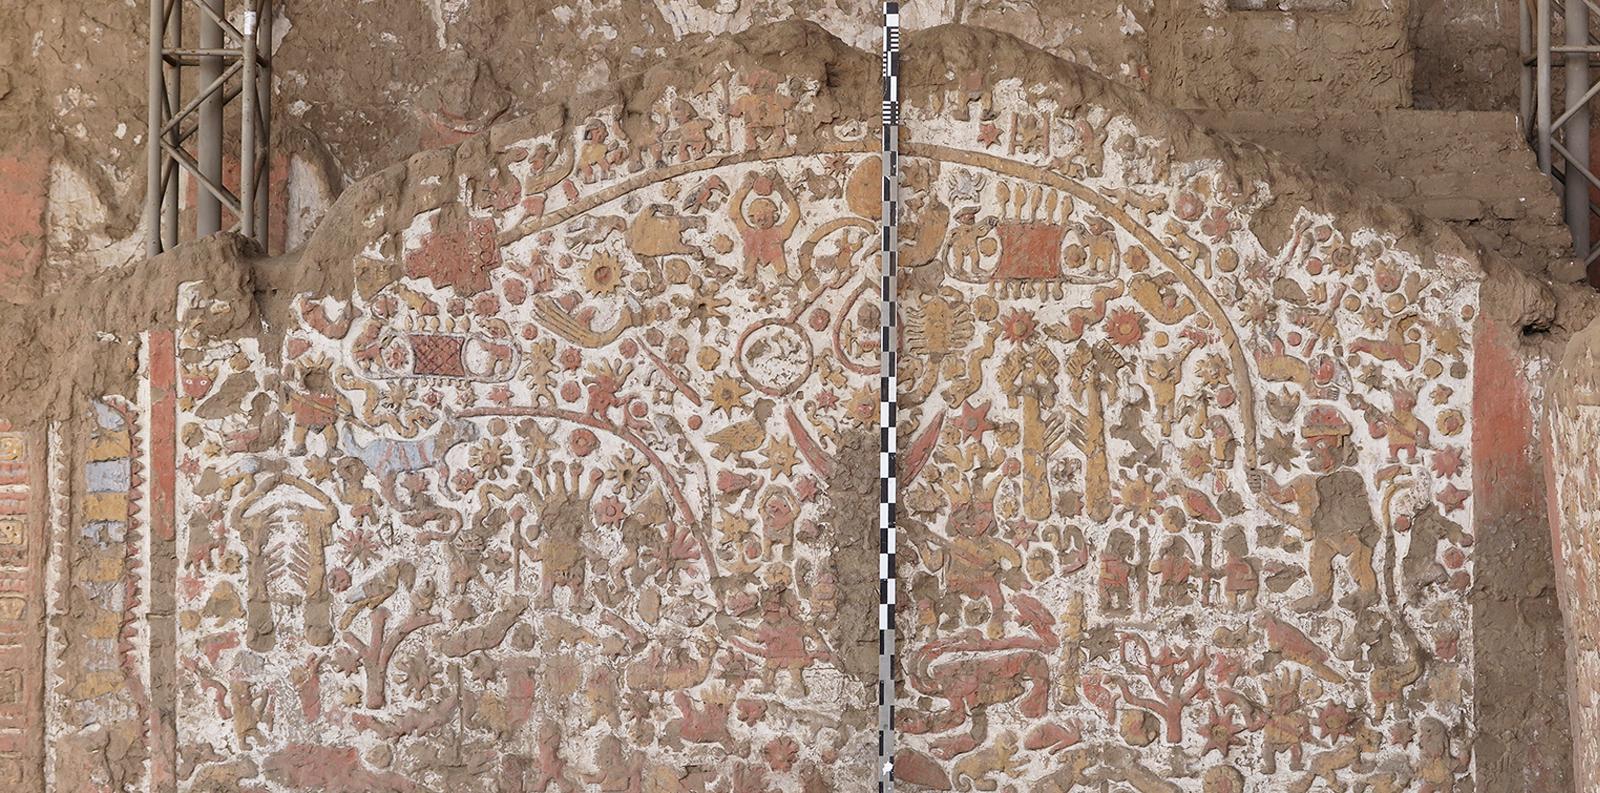 Sitios Arqueologicos Trujillio